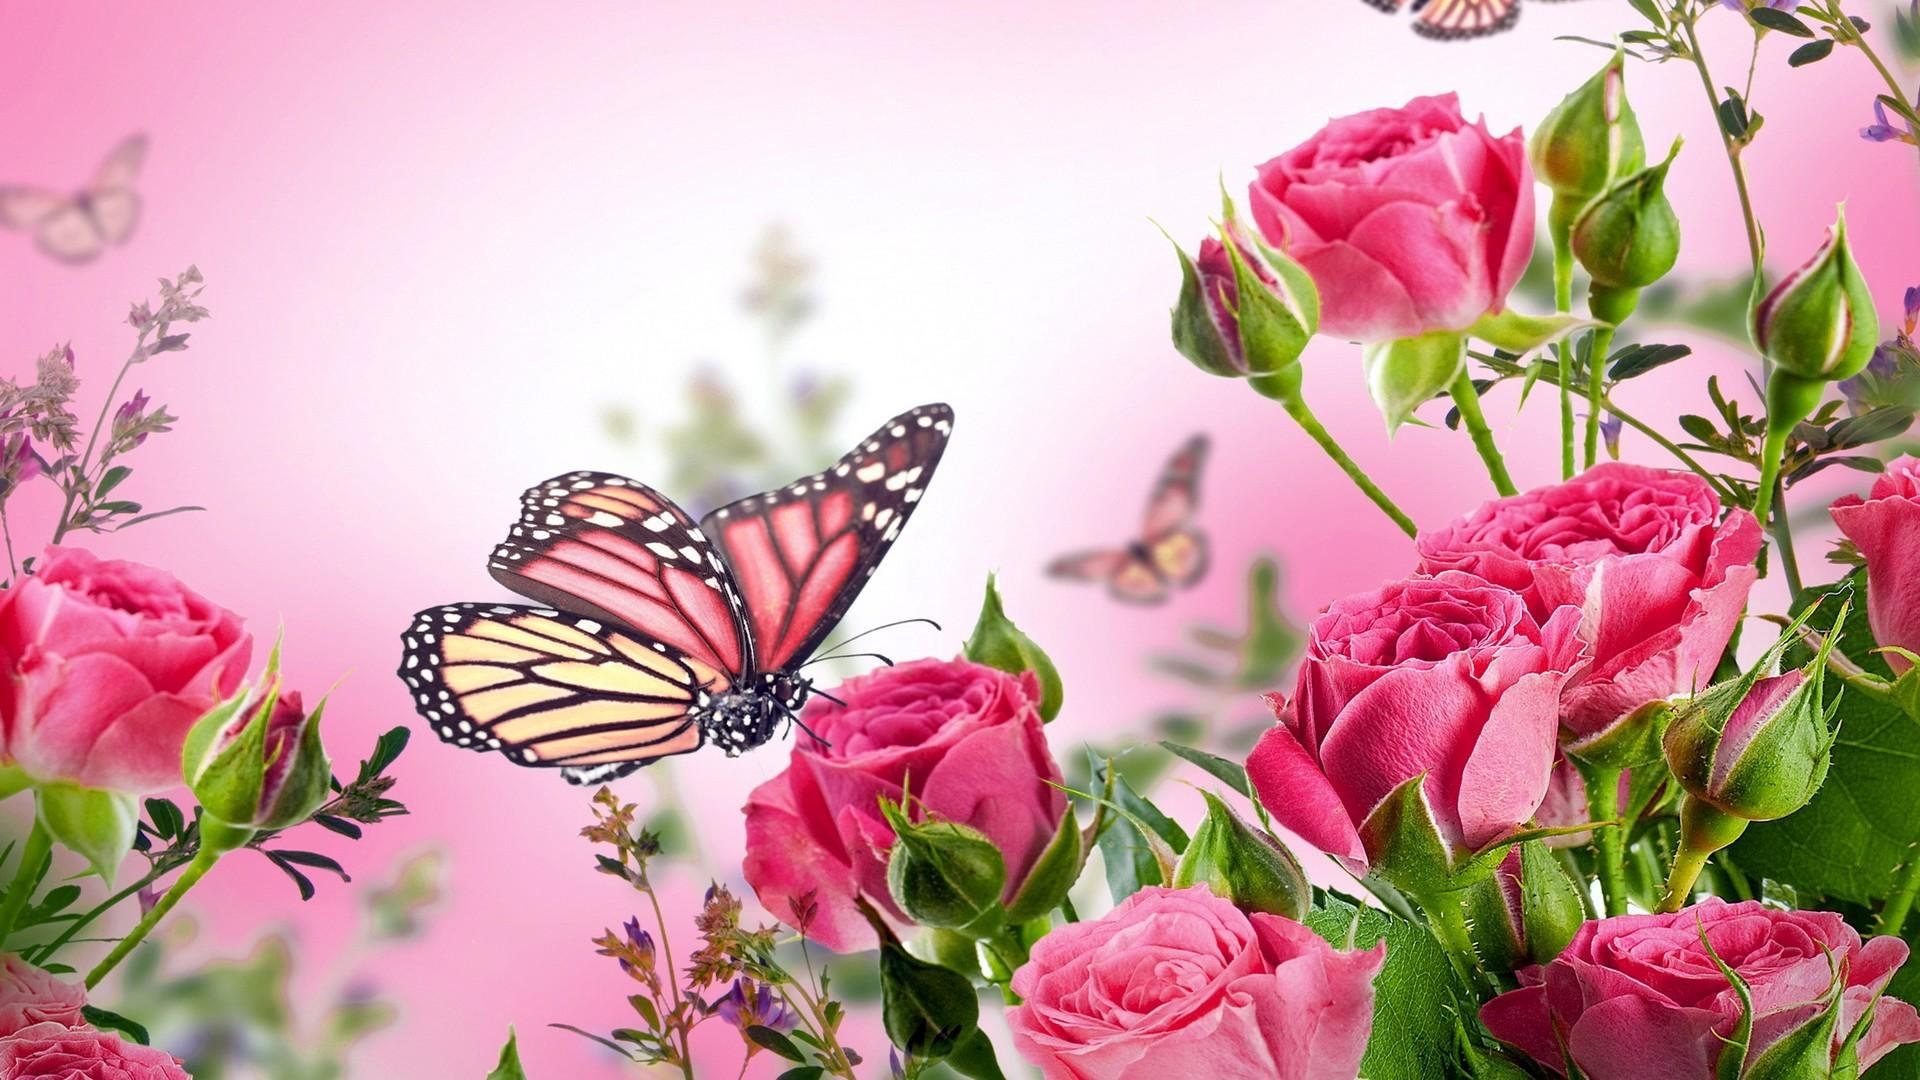 Pink Butterfly Wallpaper Hd - Flowers And Butterflies Background , HD Wallpaper & Backgrounds